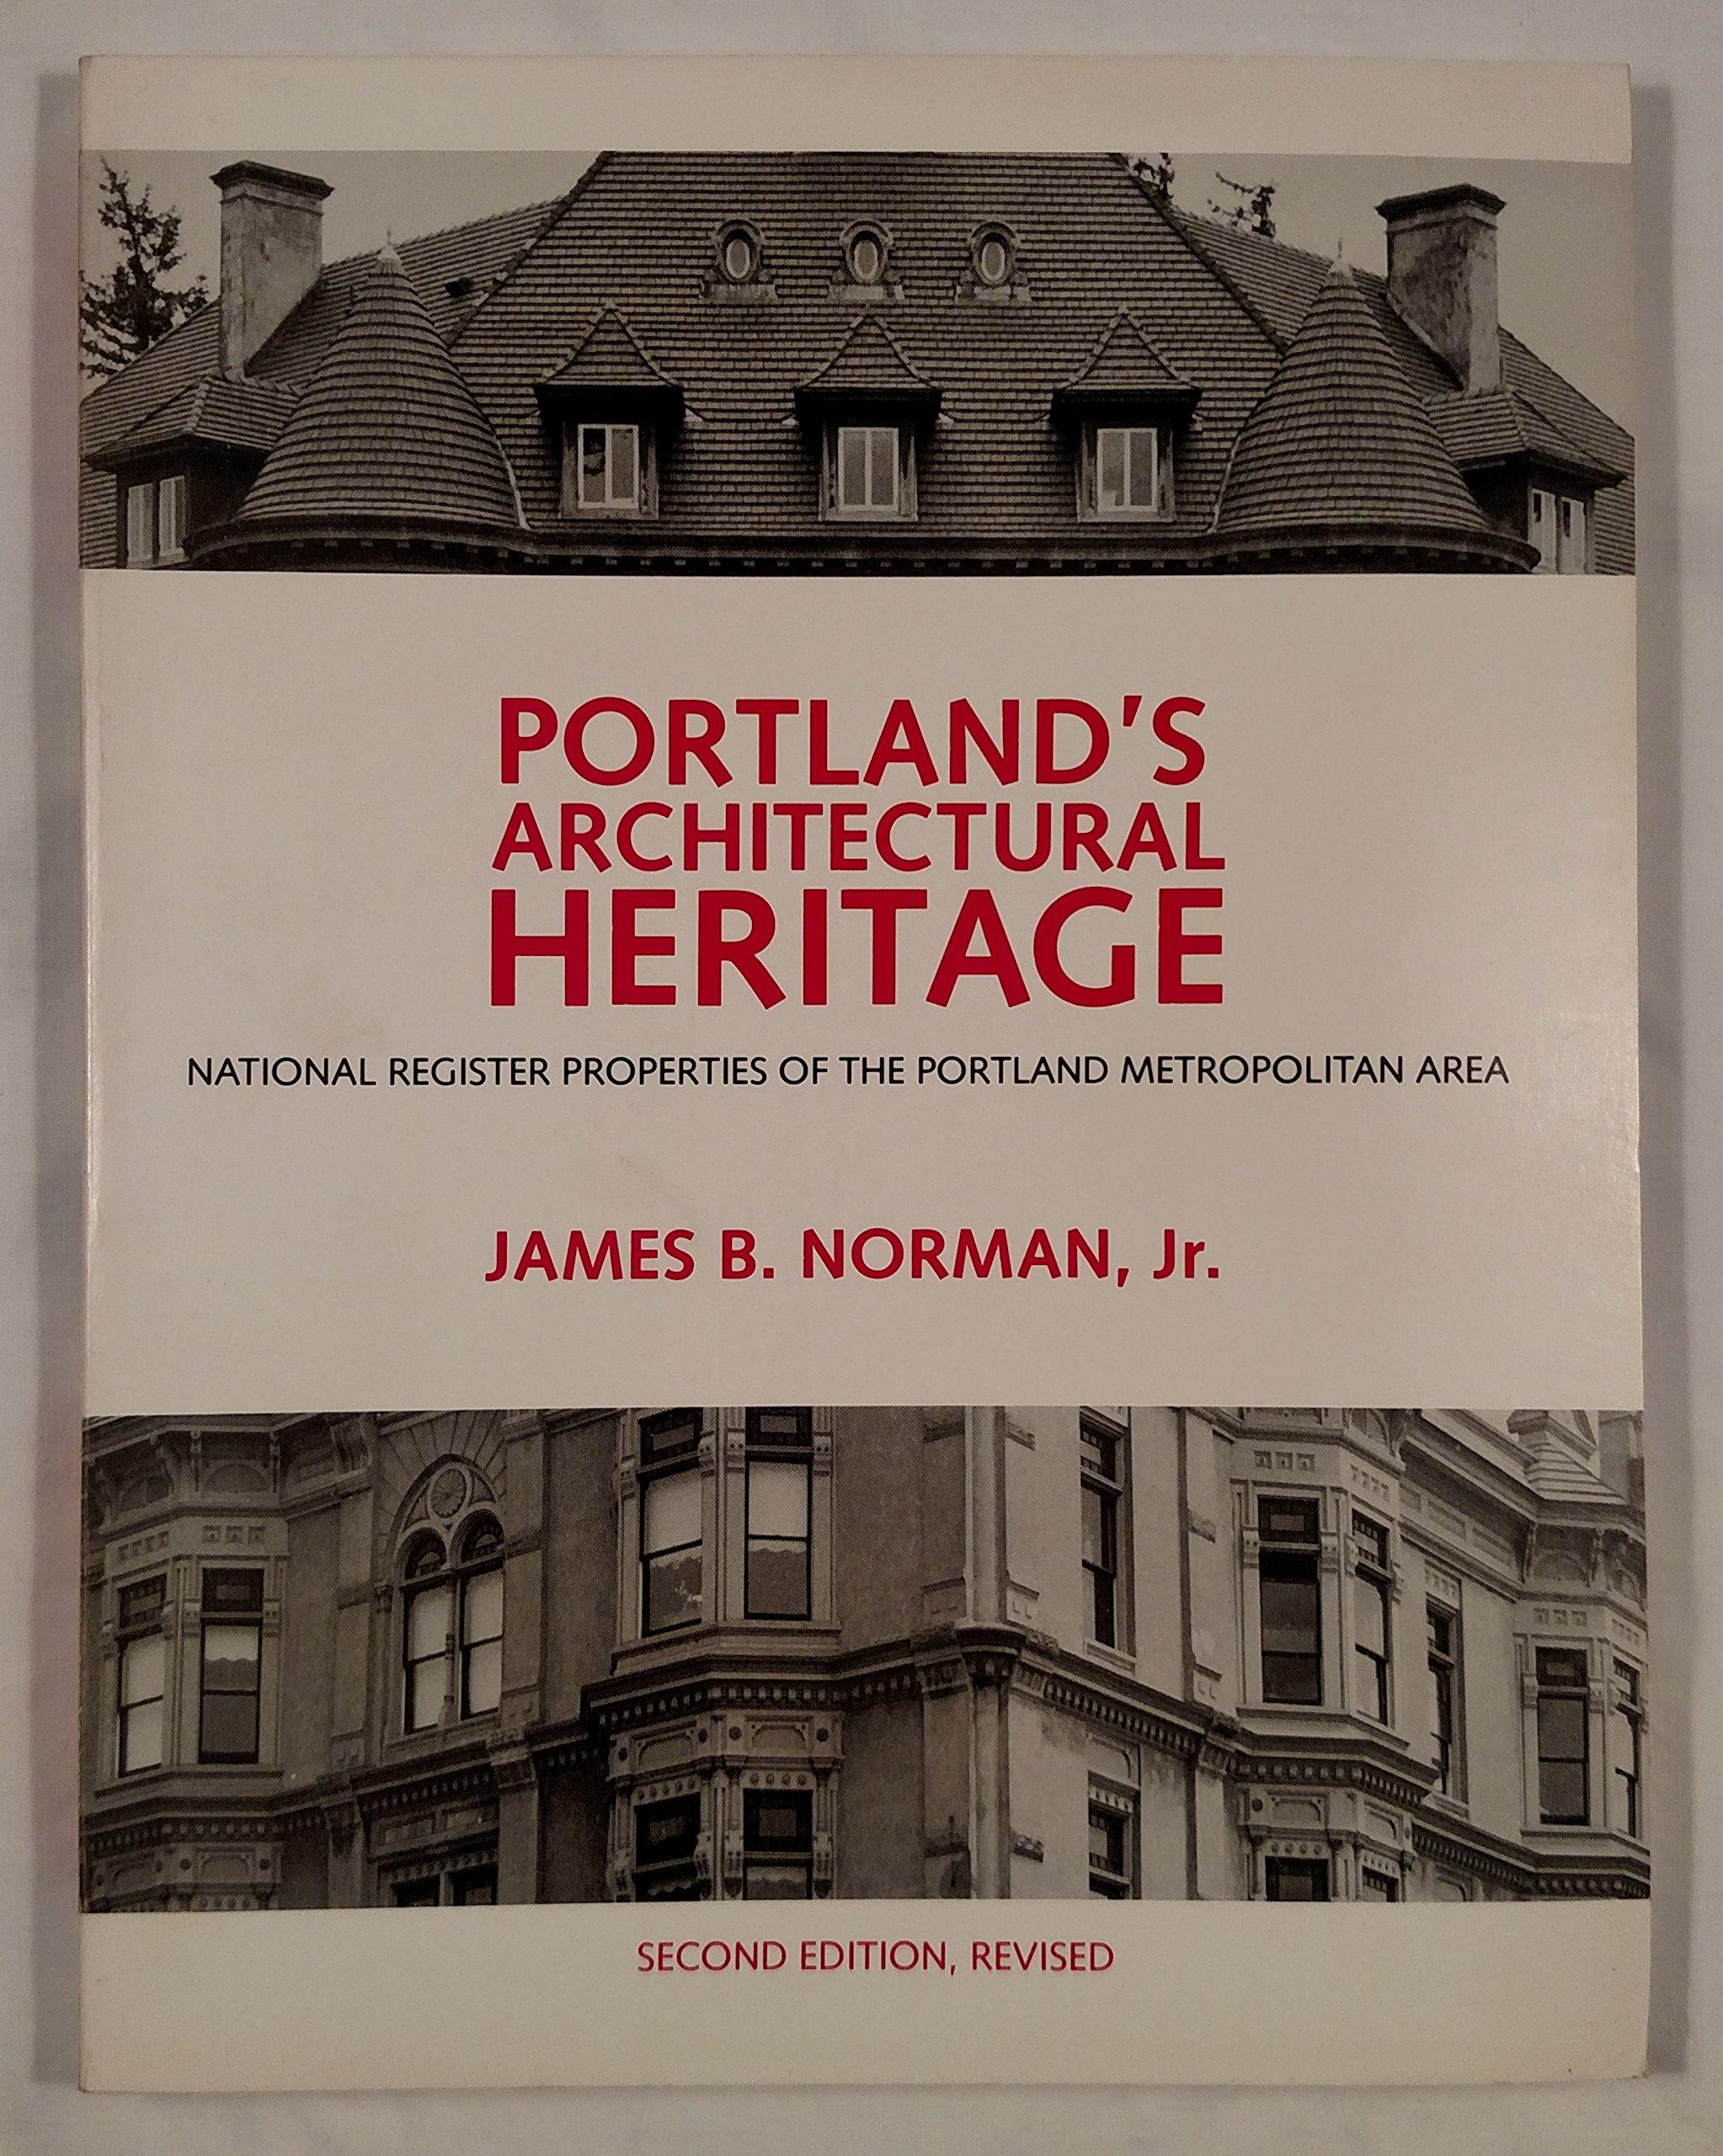 Portland's Architectural Heritage